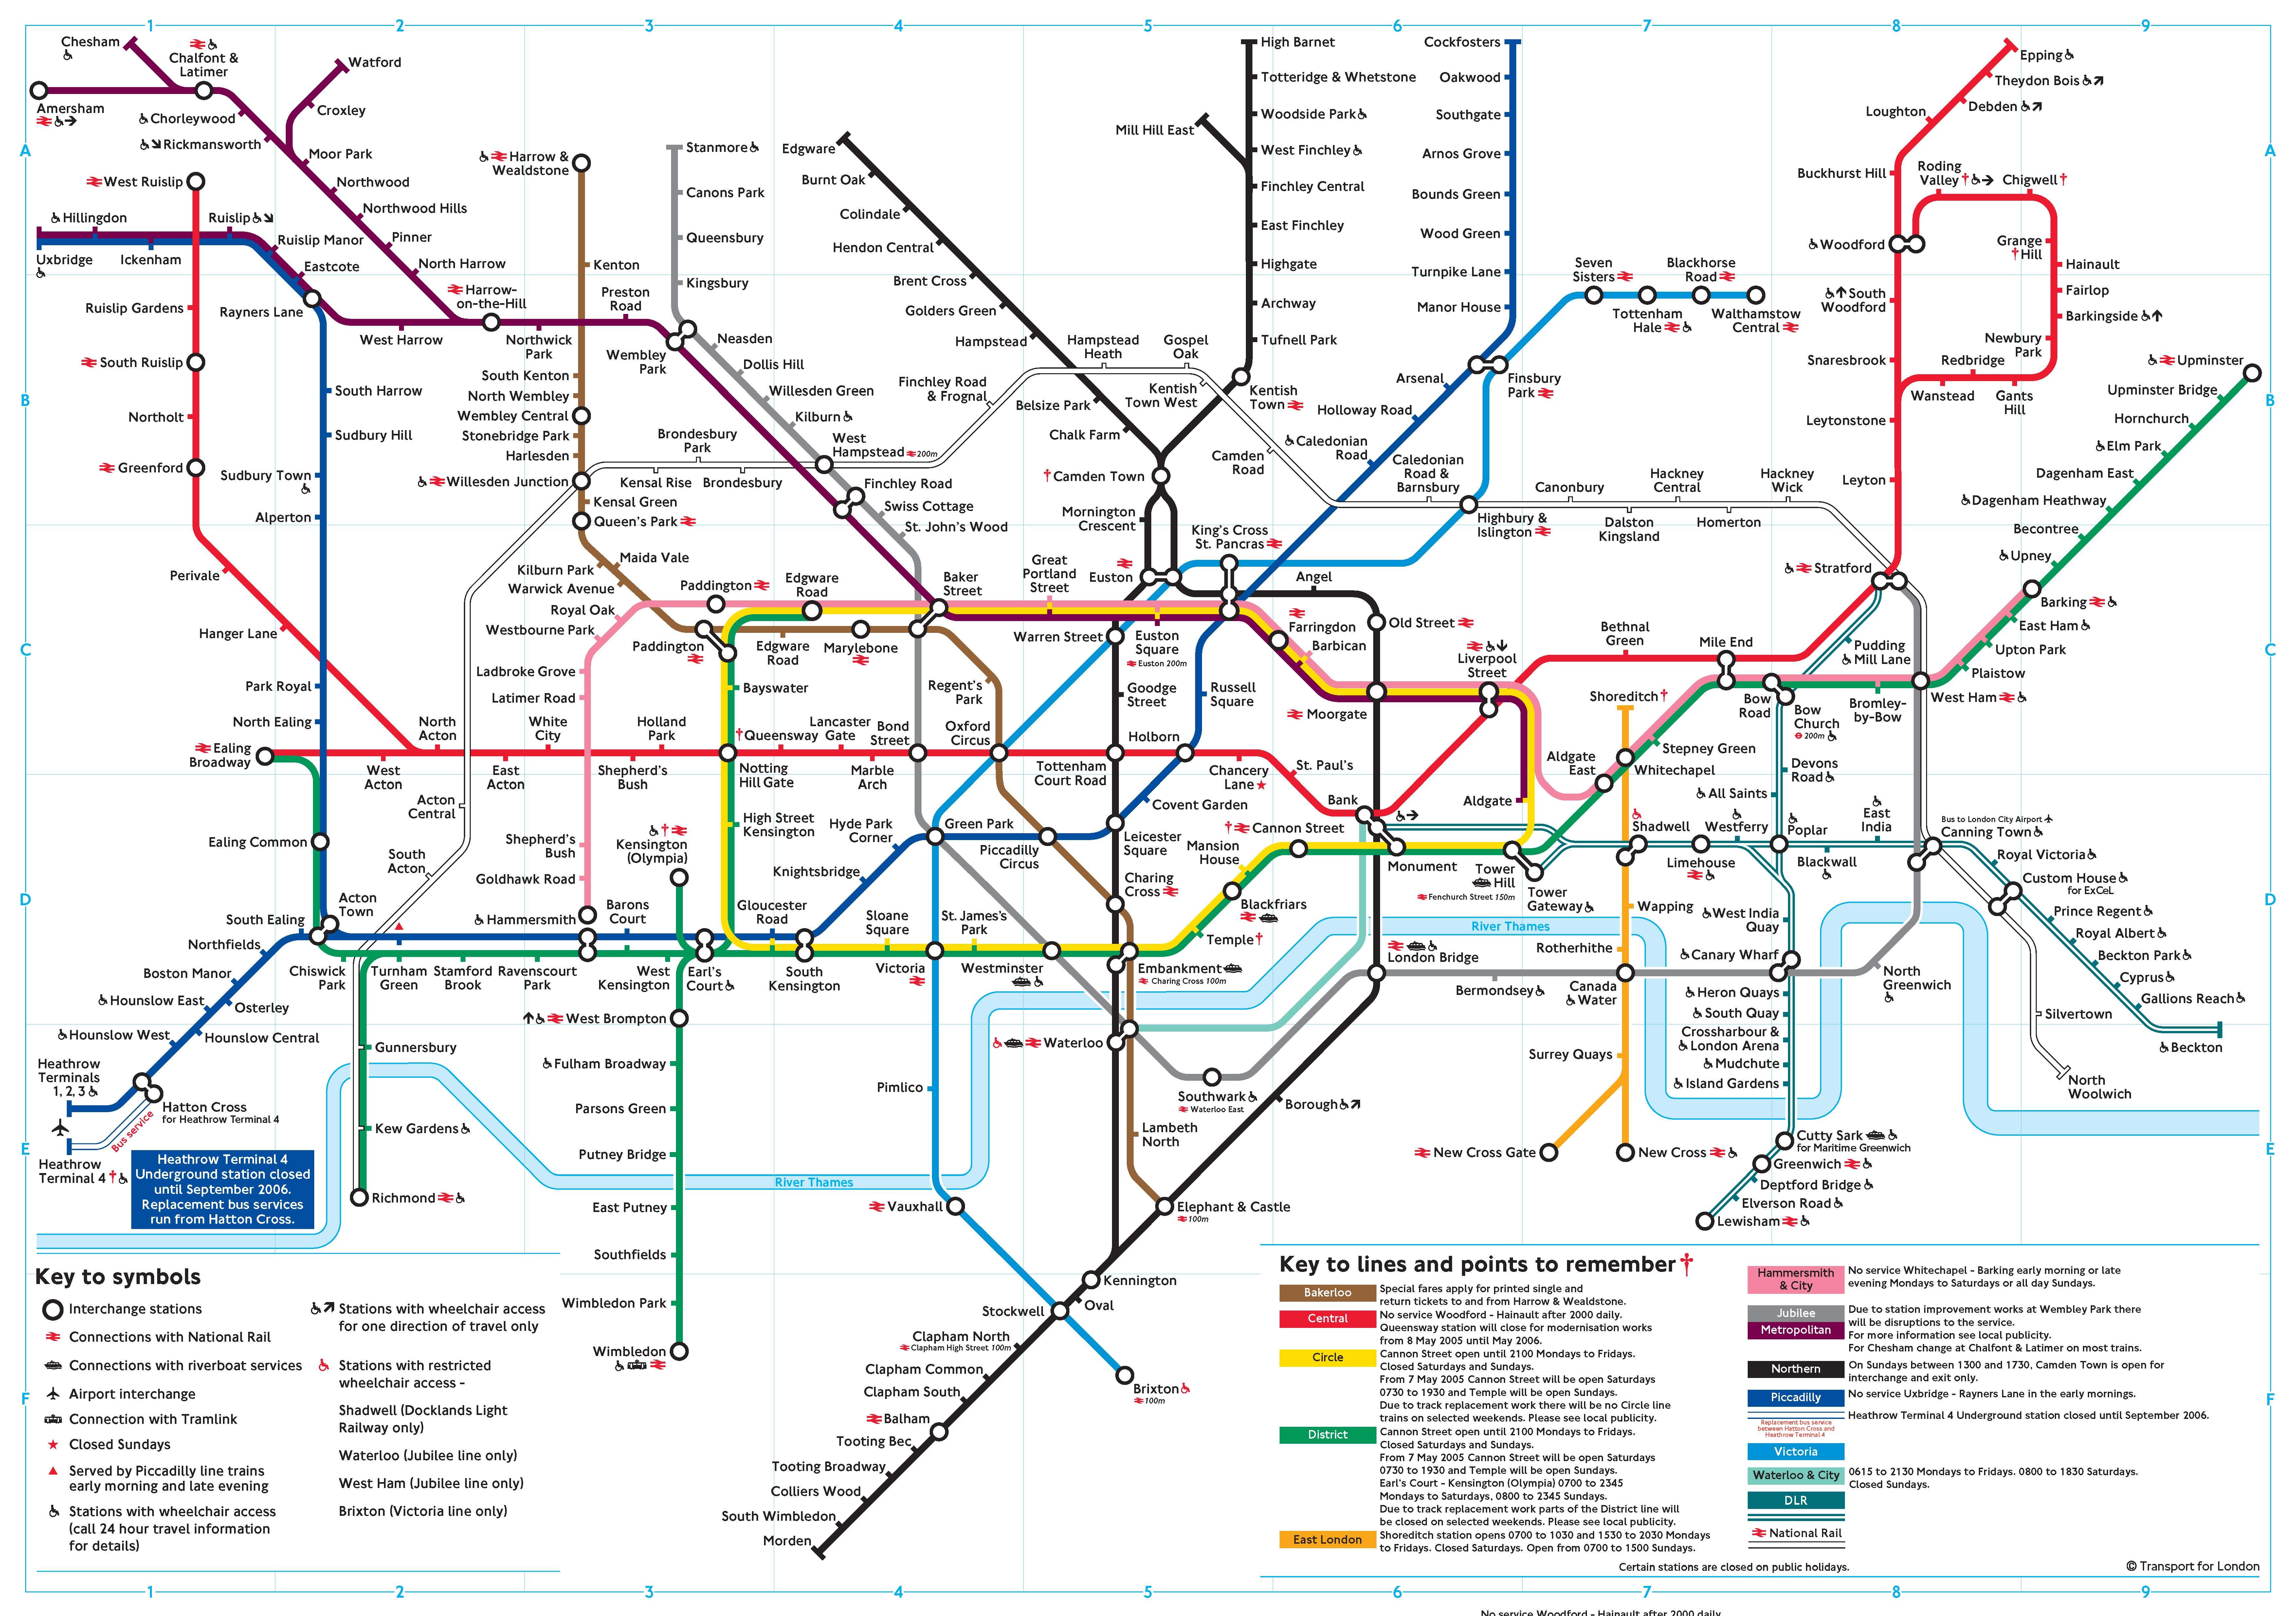 Tube Map - London tube map 2014